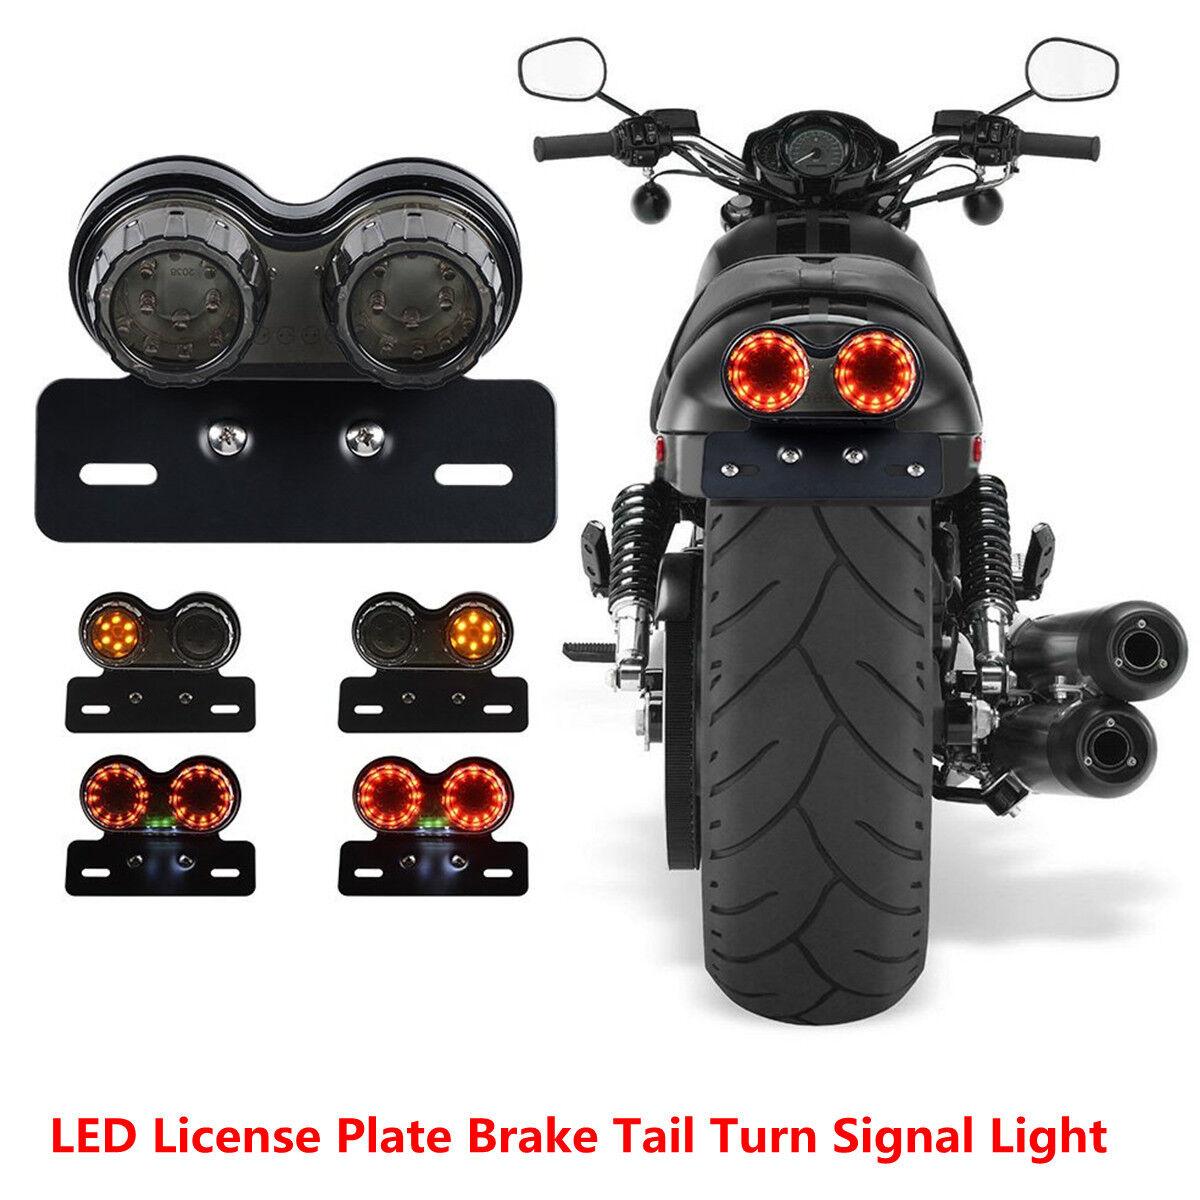 Speed and Strength Men/'s N6 Shoulder Pad Motorcycle Protection U-7094 87-9322